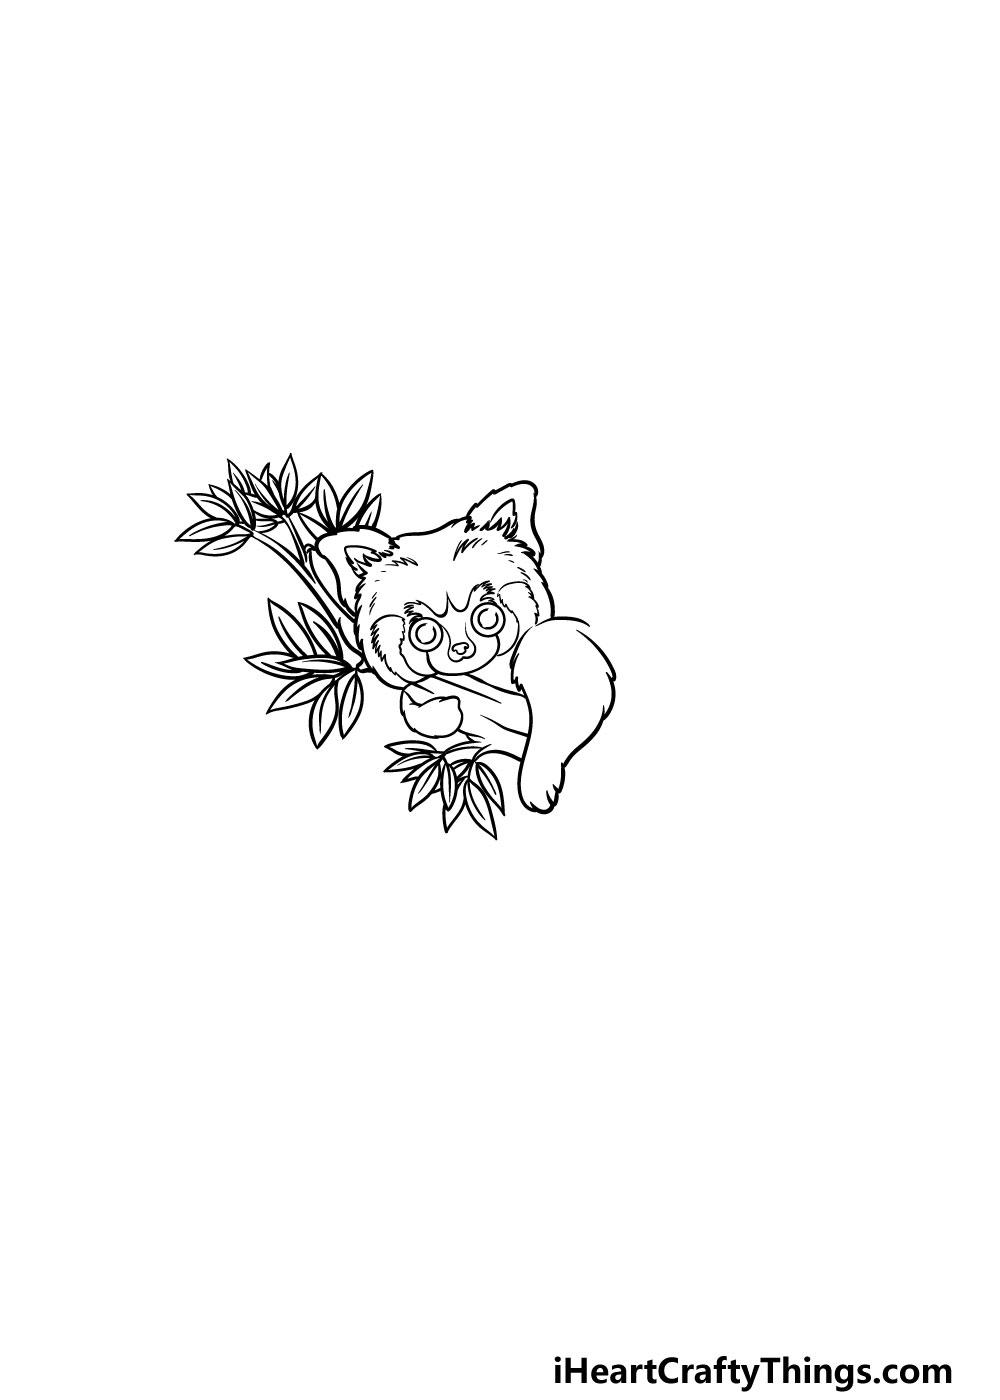 drawing a Red Panda step 3